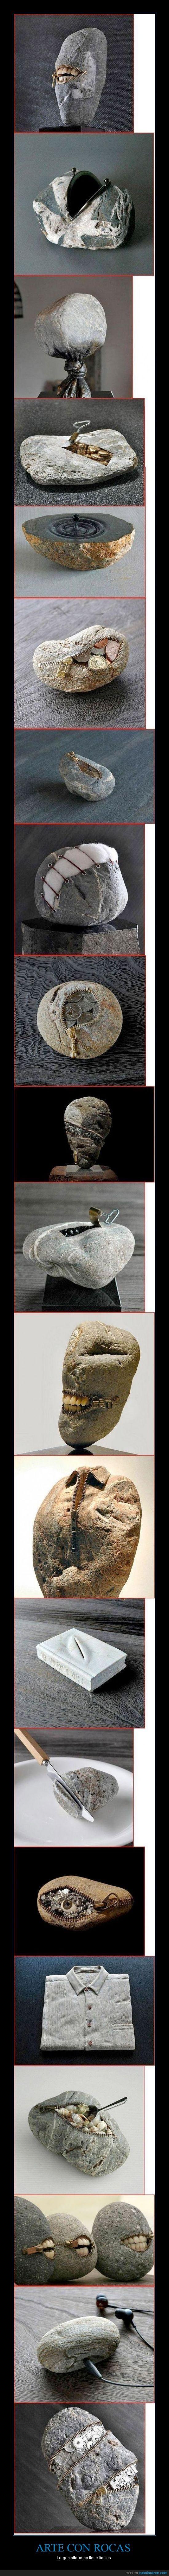 arte,auricular,boca,casco,cremallera,cuchillo,diente,engranaje,escultura,nudo,ojo,roca,sistema